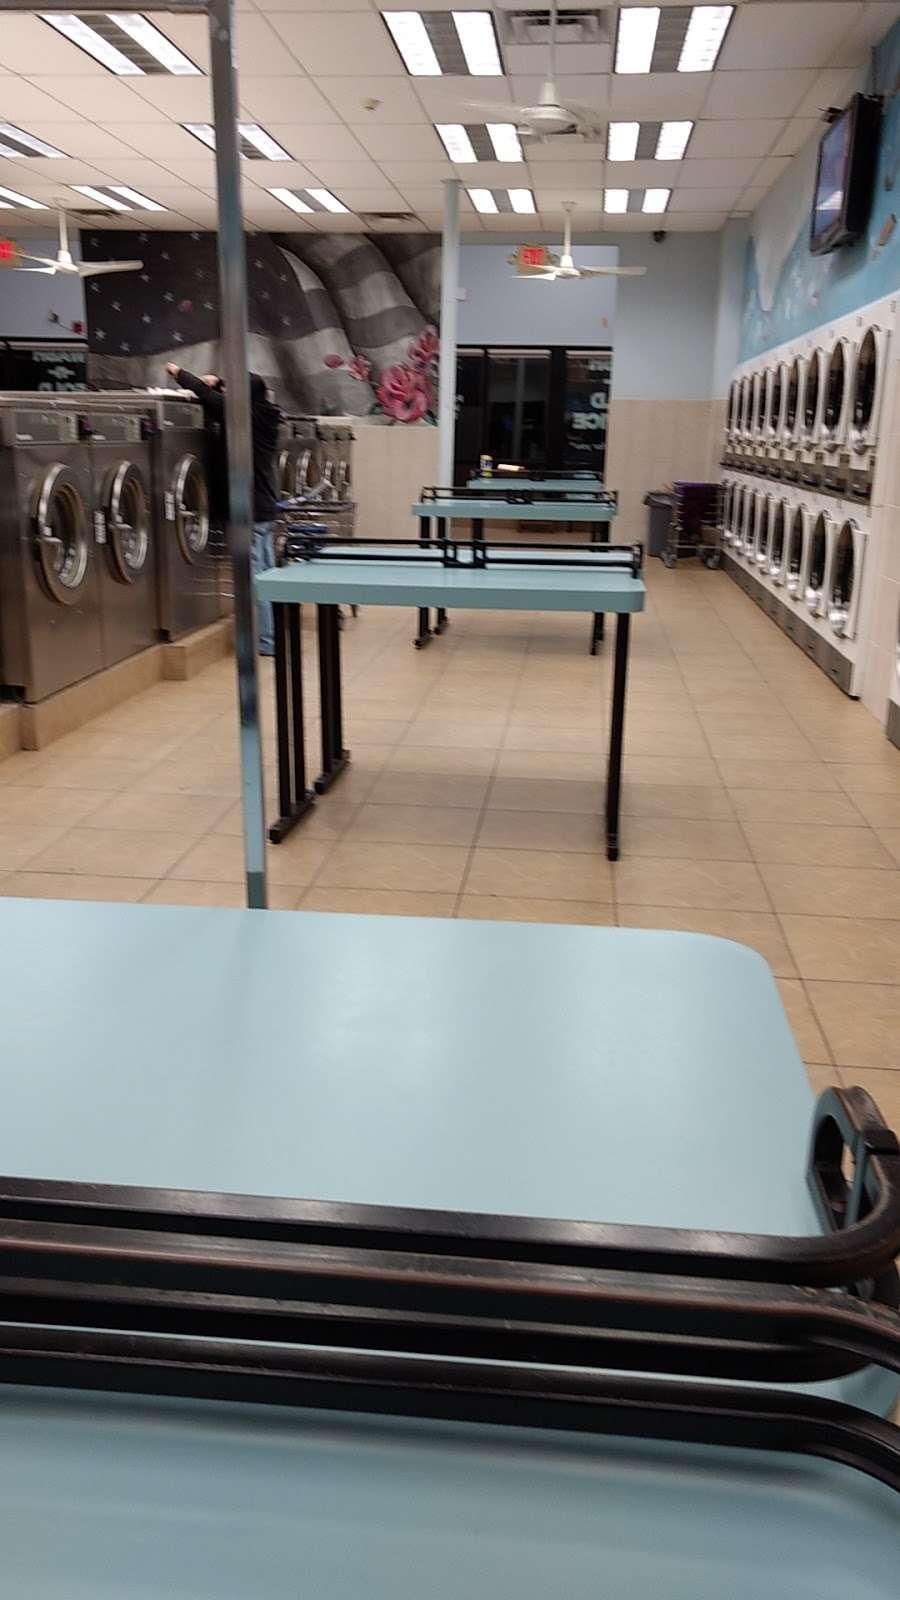 Arlington Laundromat - laundry  | Photo 1 of 5 | Address: 493 Ridge Rd, North Arlington, NJ 07031, USA | Phone: (201) 997-5757